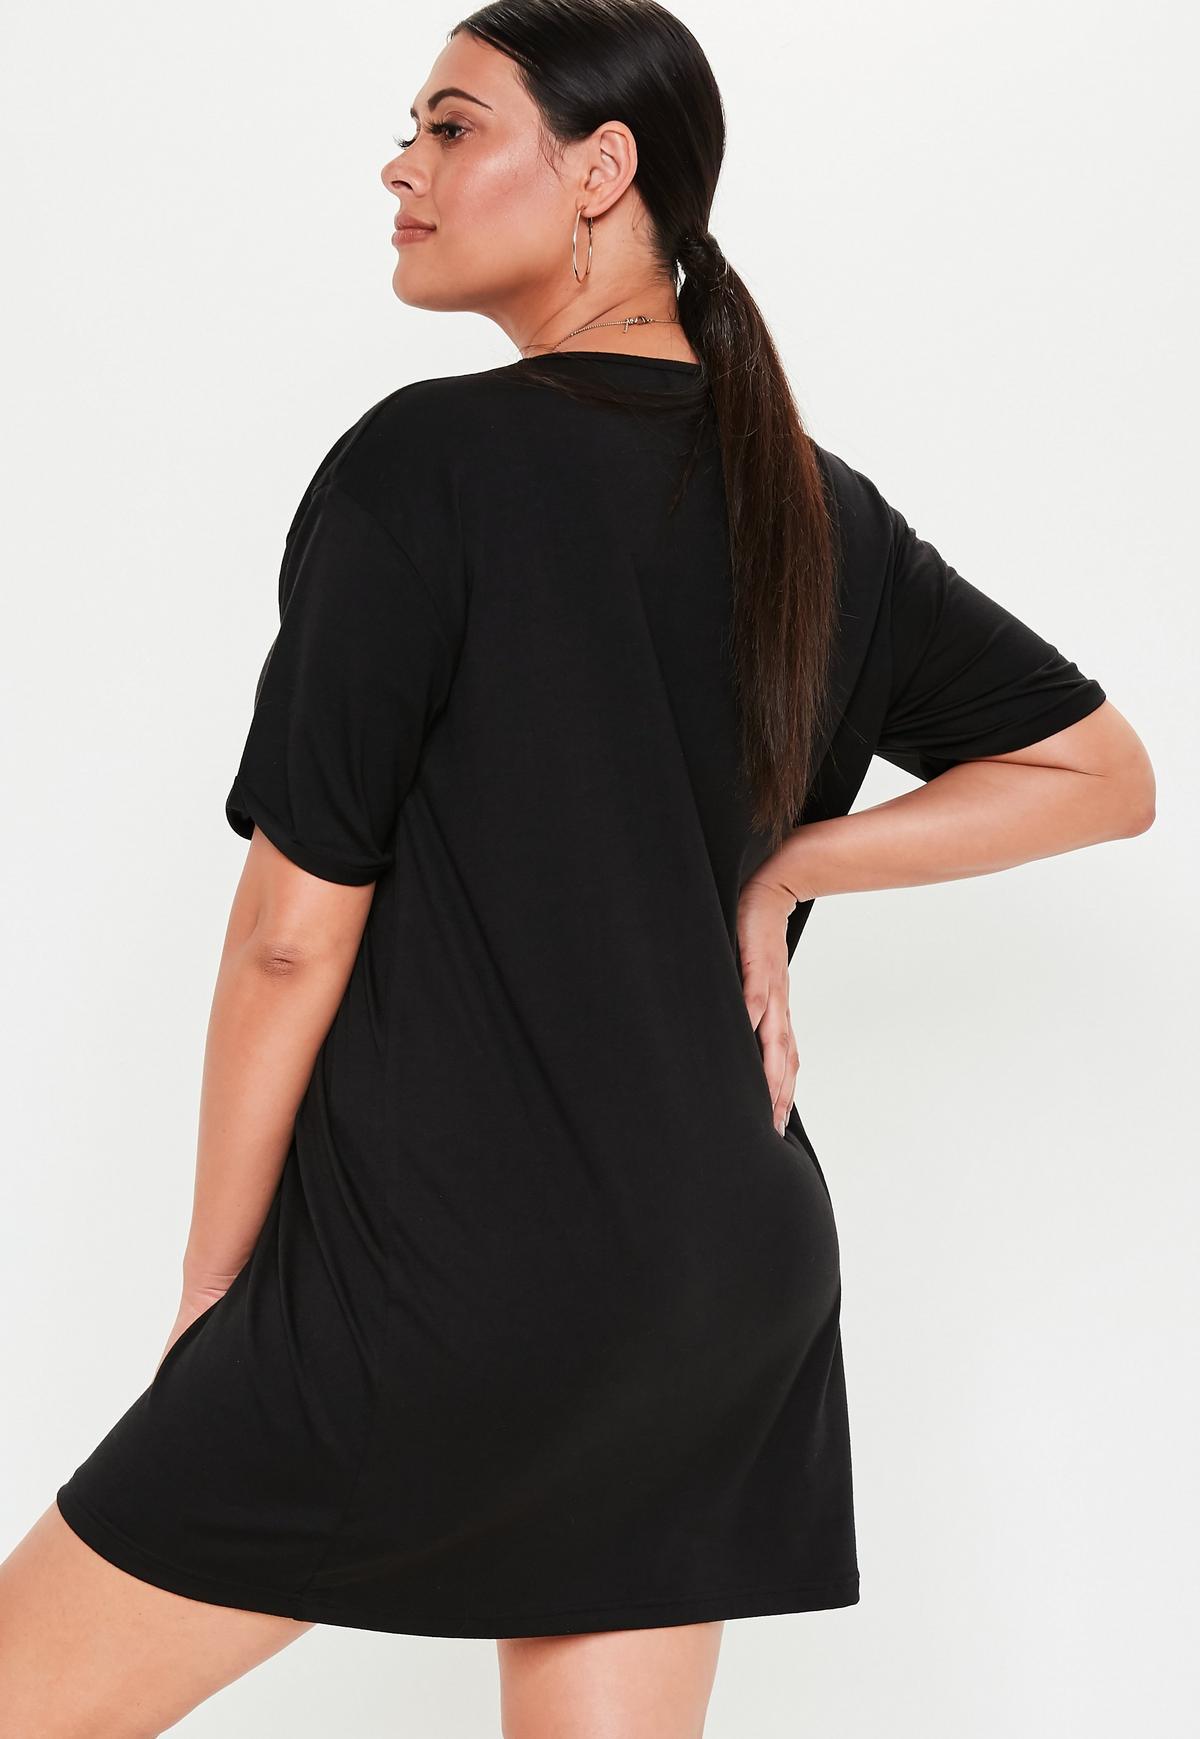 Plus Size Black Oversized T Shirt Dress